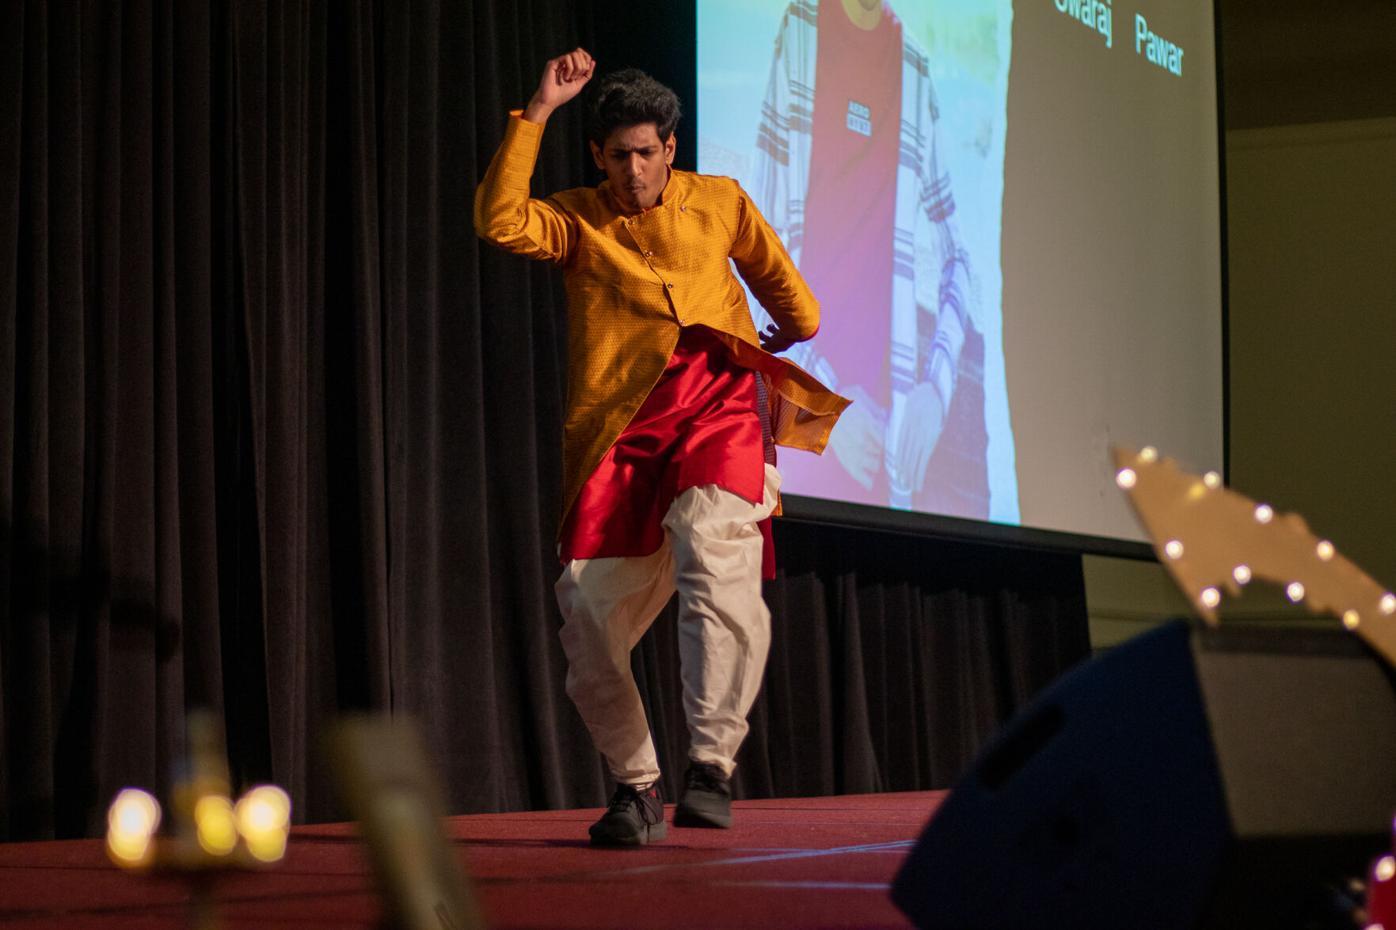 PHOTOS: UGA's Indian Student Association hosts 'India Nite'